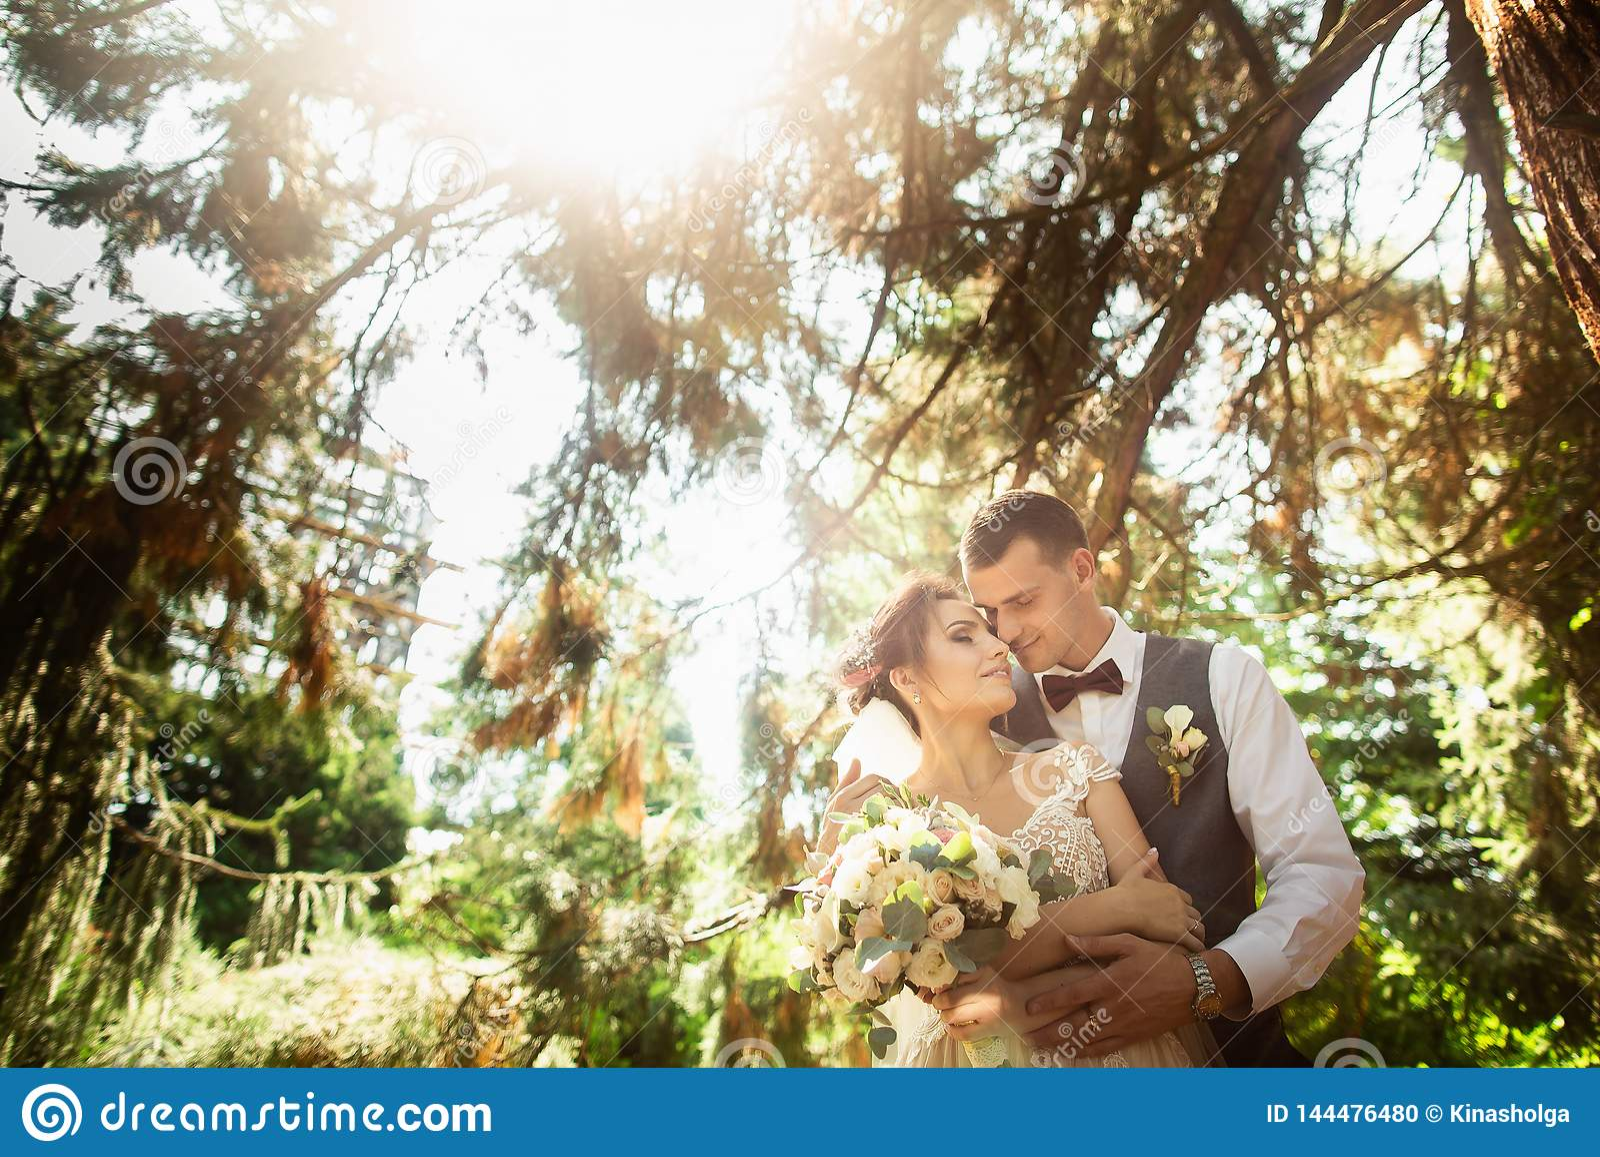 Beautiful sunny day. Wedding couple posing on the background of nature